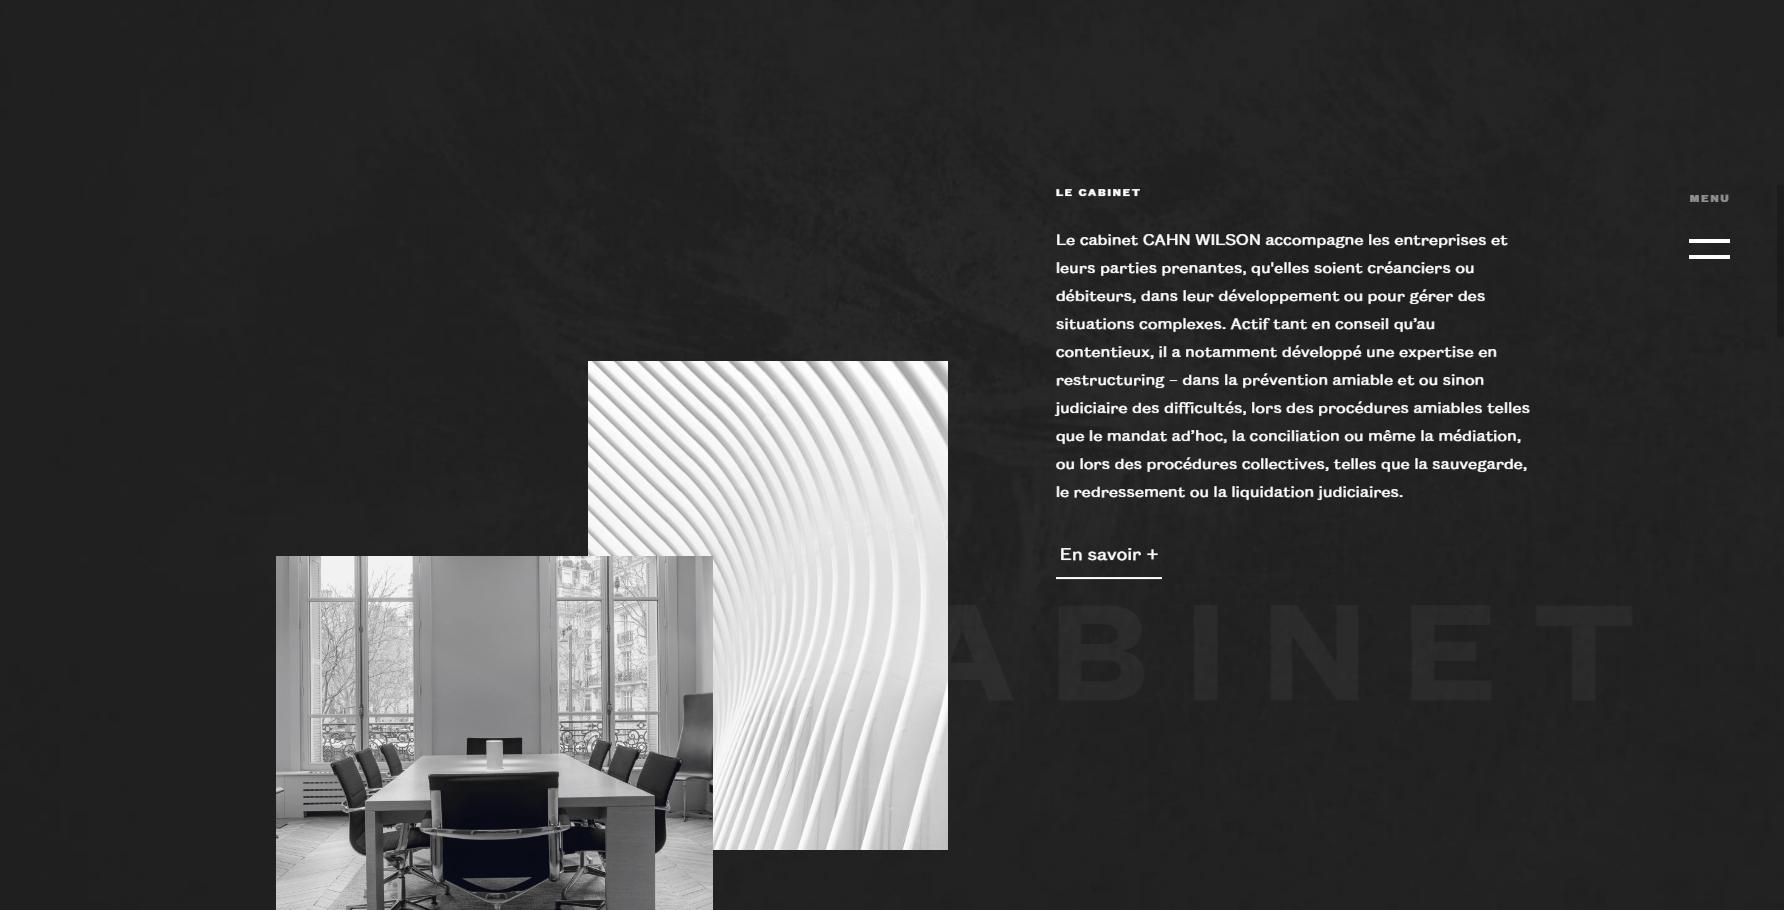 Cahn Wilson - Website of the Day